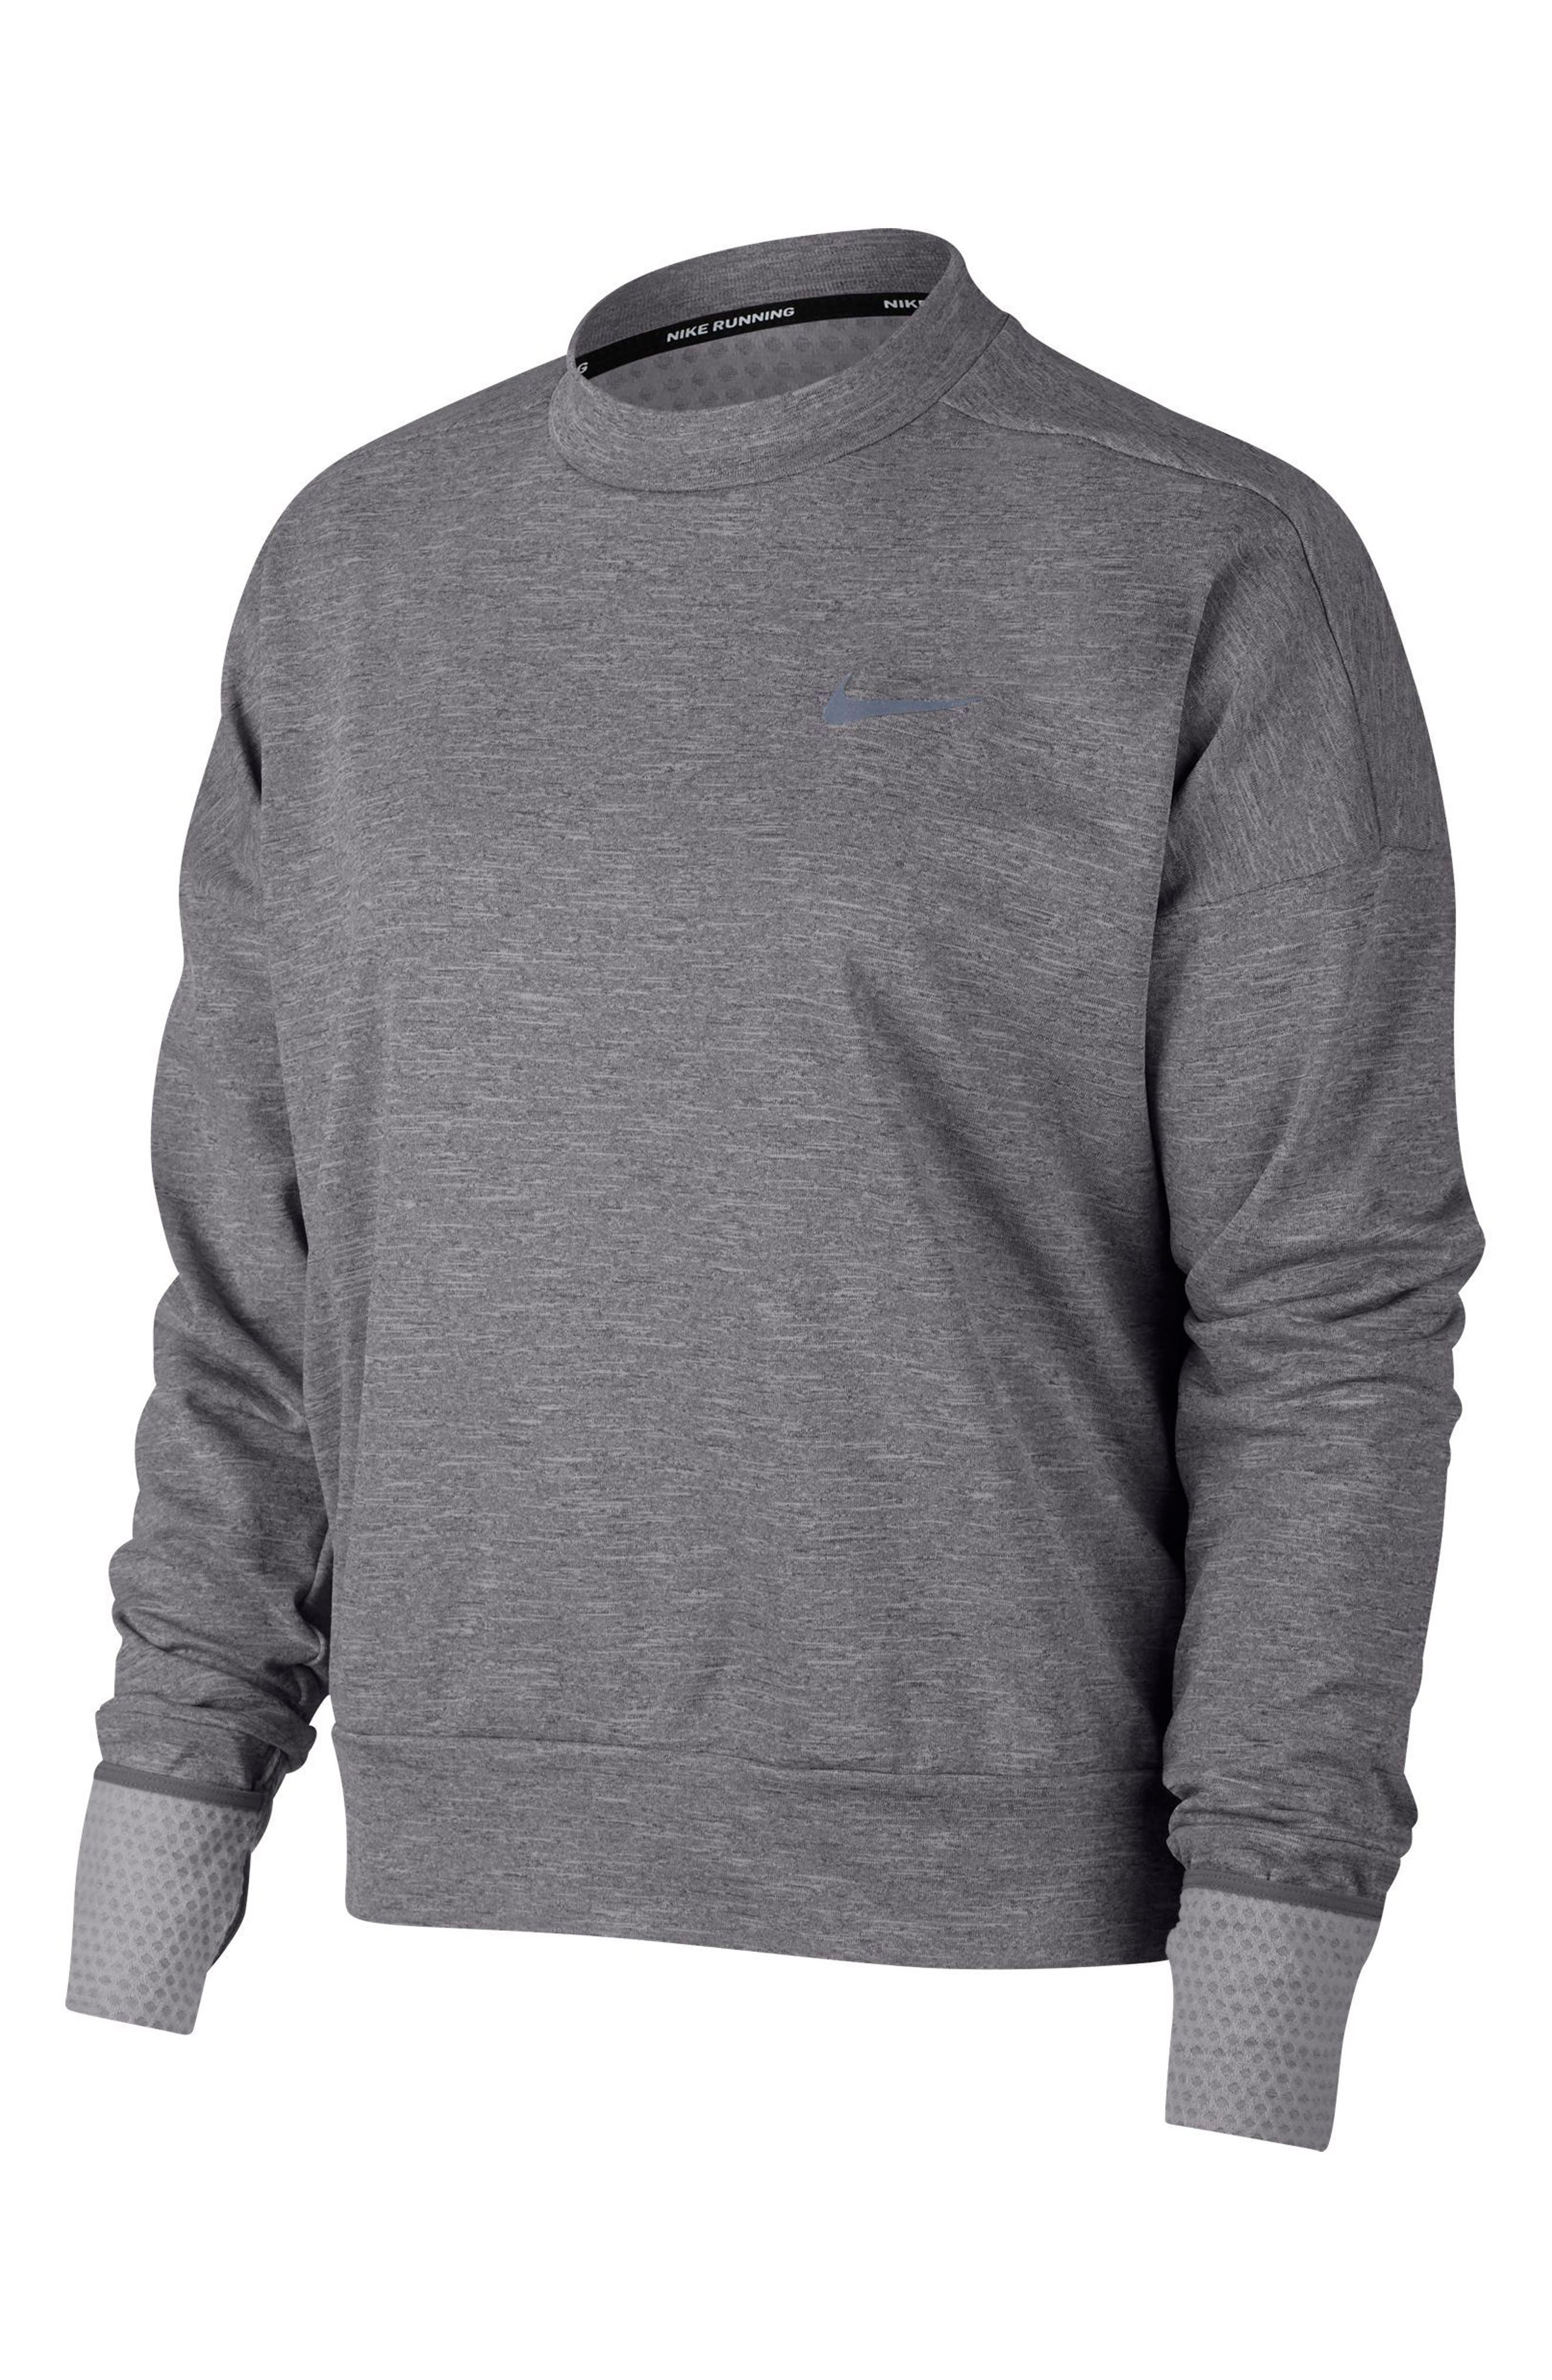 b4c0b76a Women's Nike Sweatshirts & Hoodies | Nordstrom